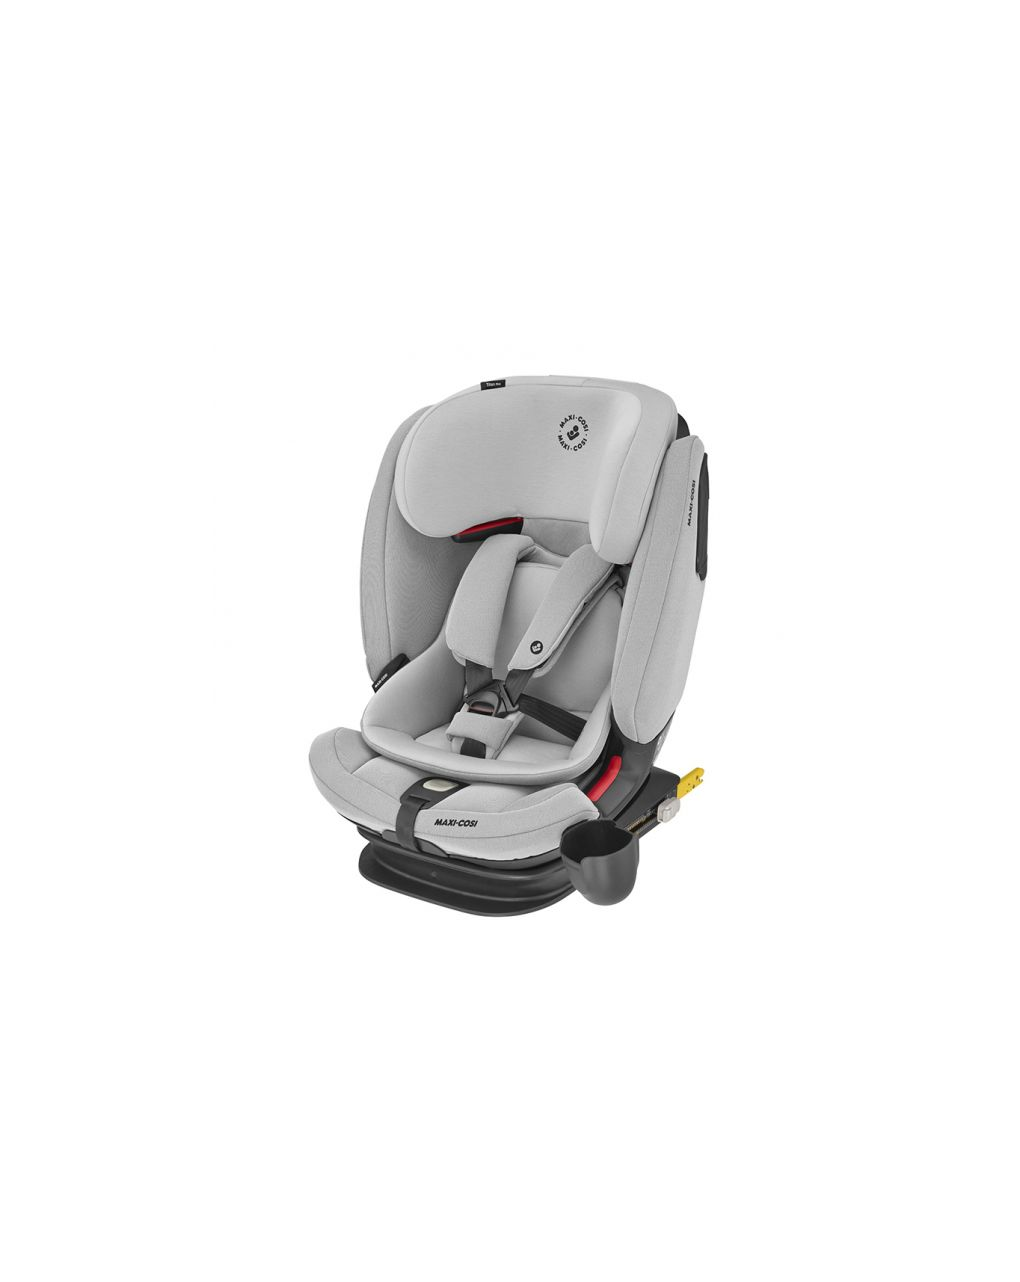 Maxi-Cosi Κάθισμα αυτοκινήτου Titan Pro Authentic Grey Ομ.1-2-3